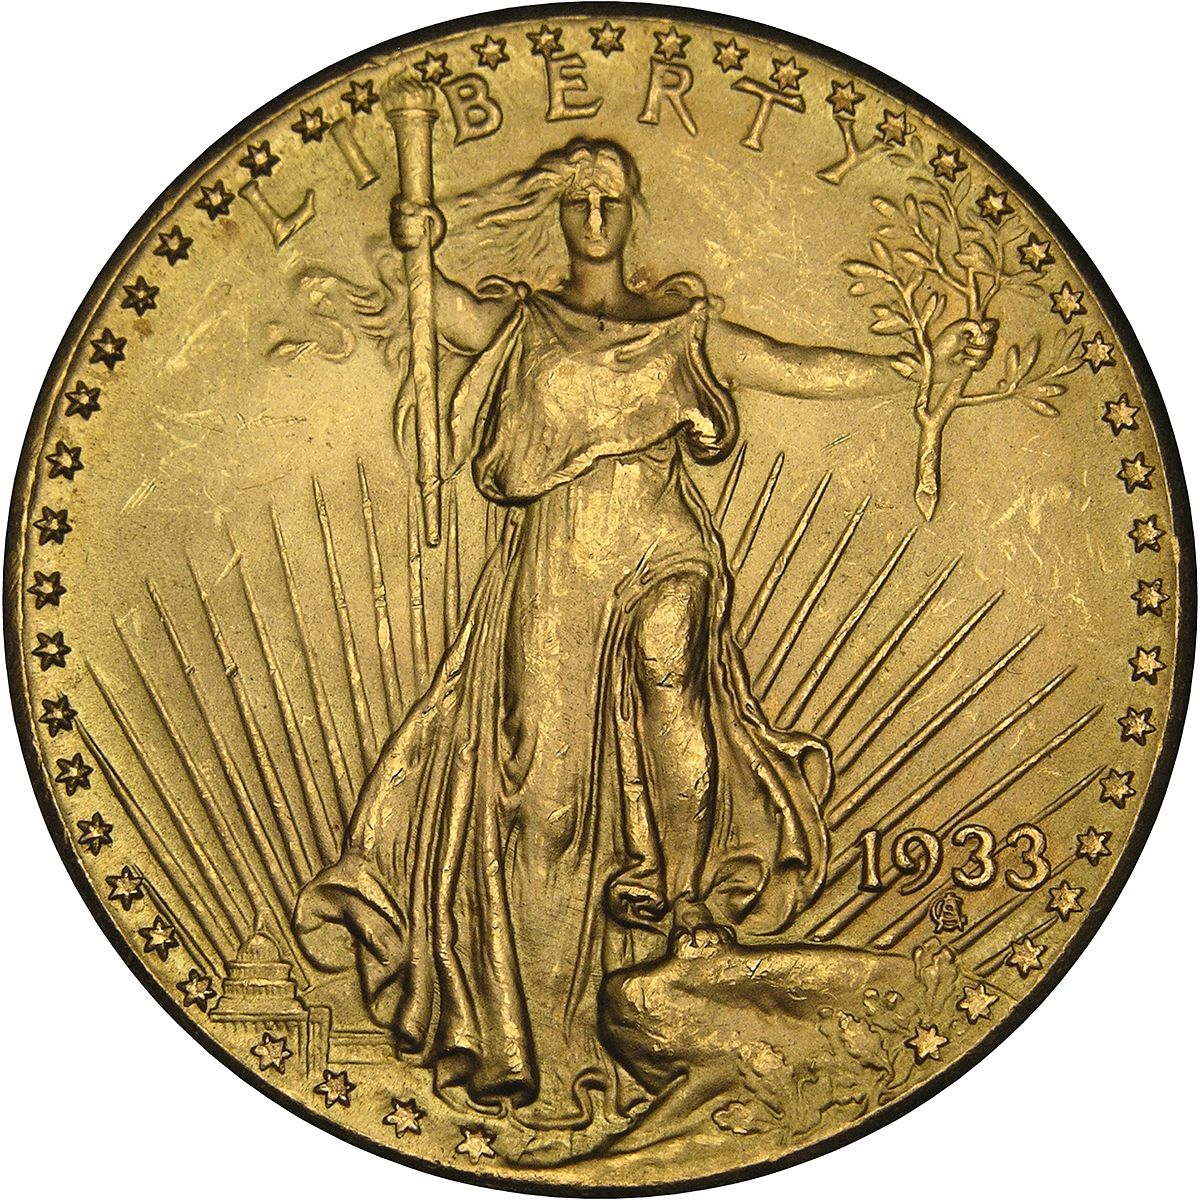 Double Eagle De 1933 Wikipedia